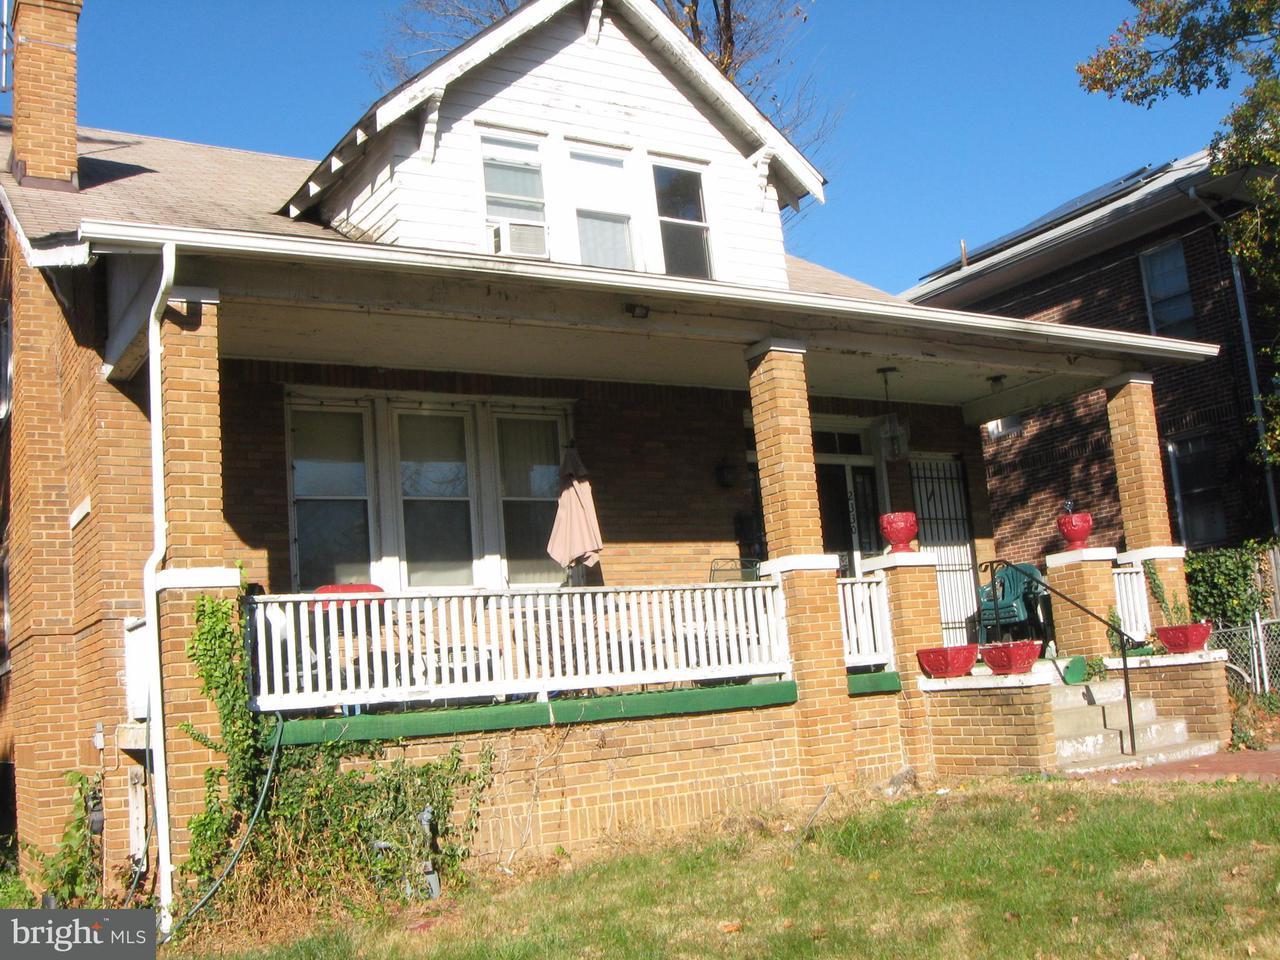 Additional photo for property listing at 2330 R St Se 2330 R St Se Washington, Округ Колумбия 20020 Соединенные Штаты